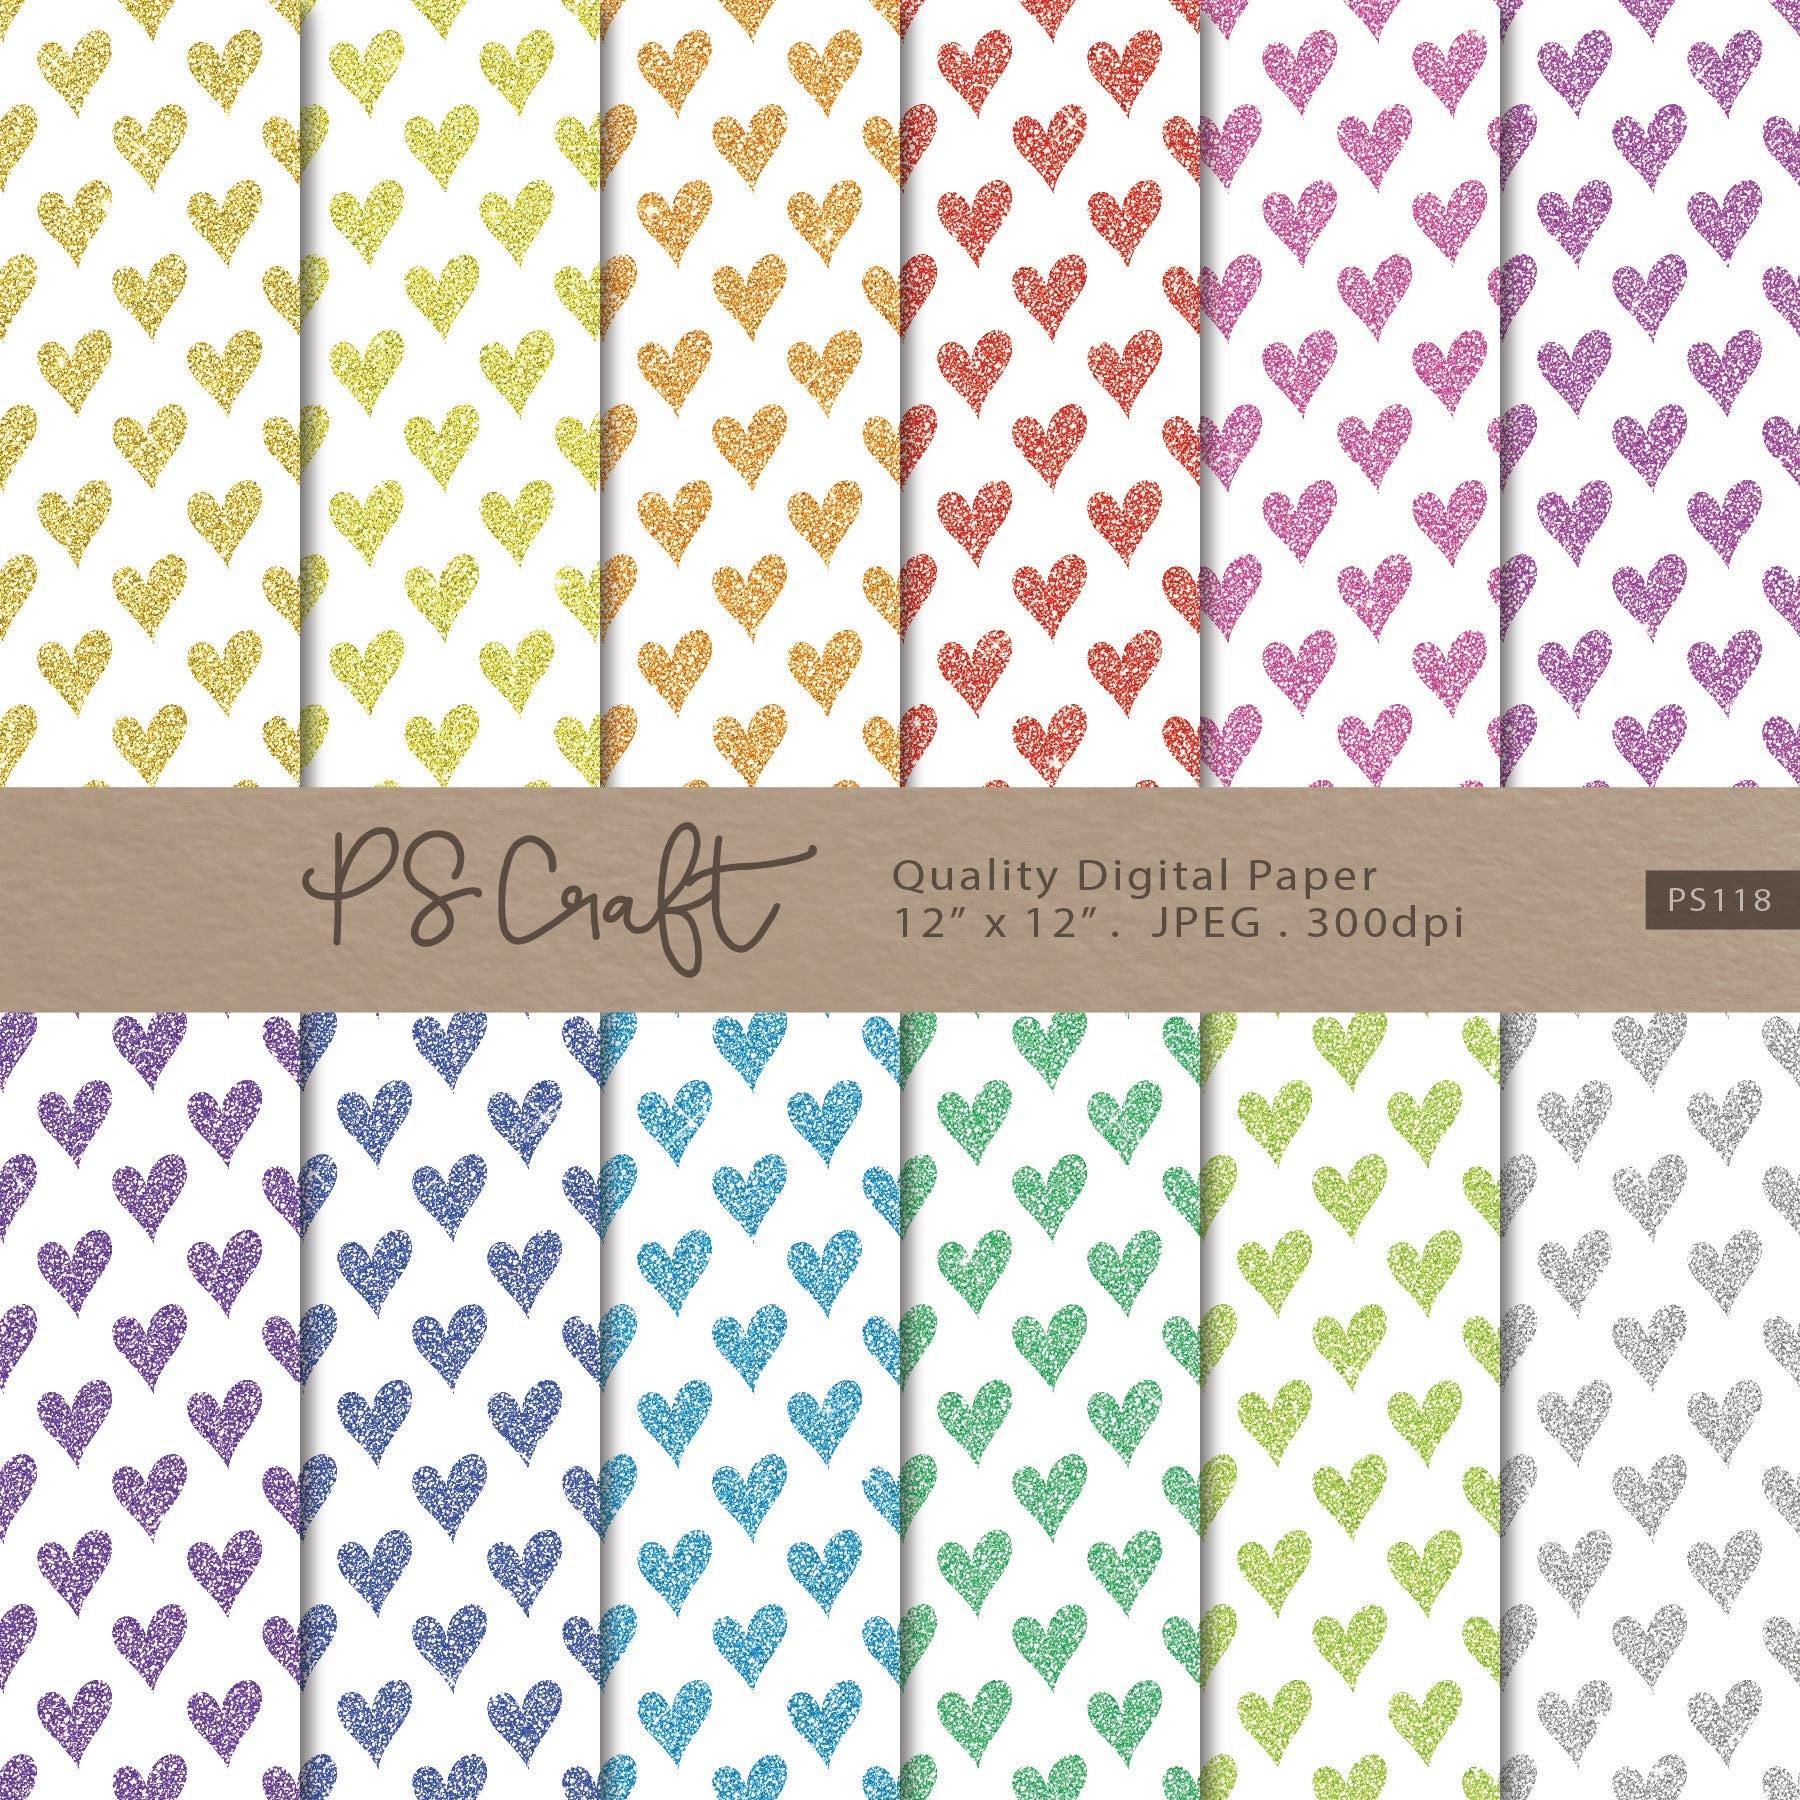 Glitter Heart Digital Paper Pack SEAMLESS Glitter Hearts